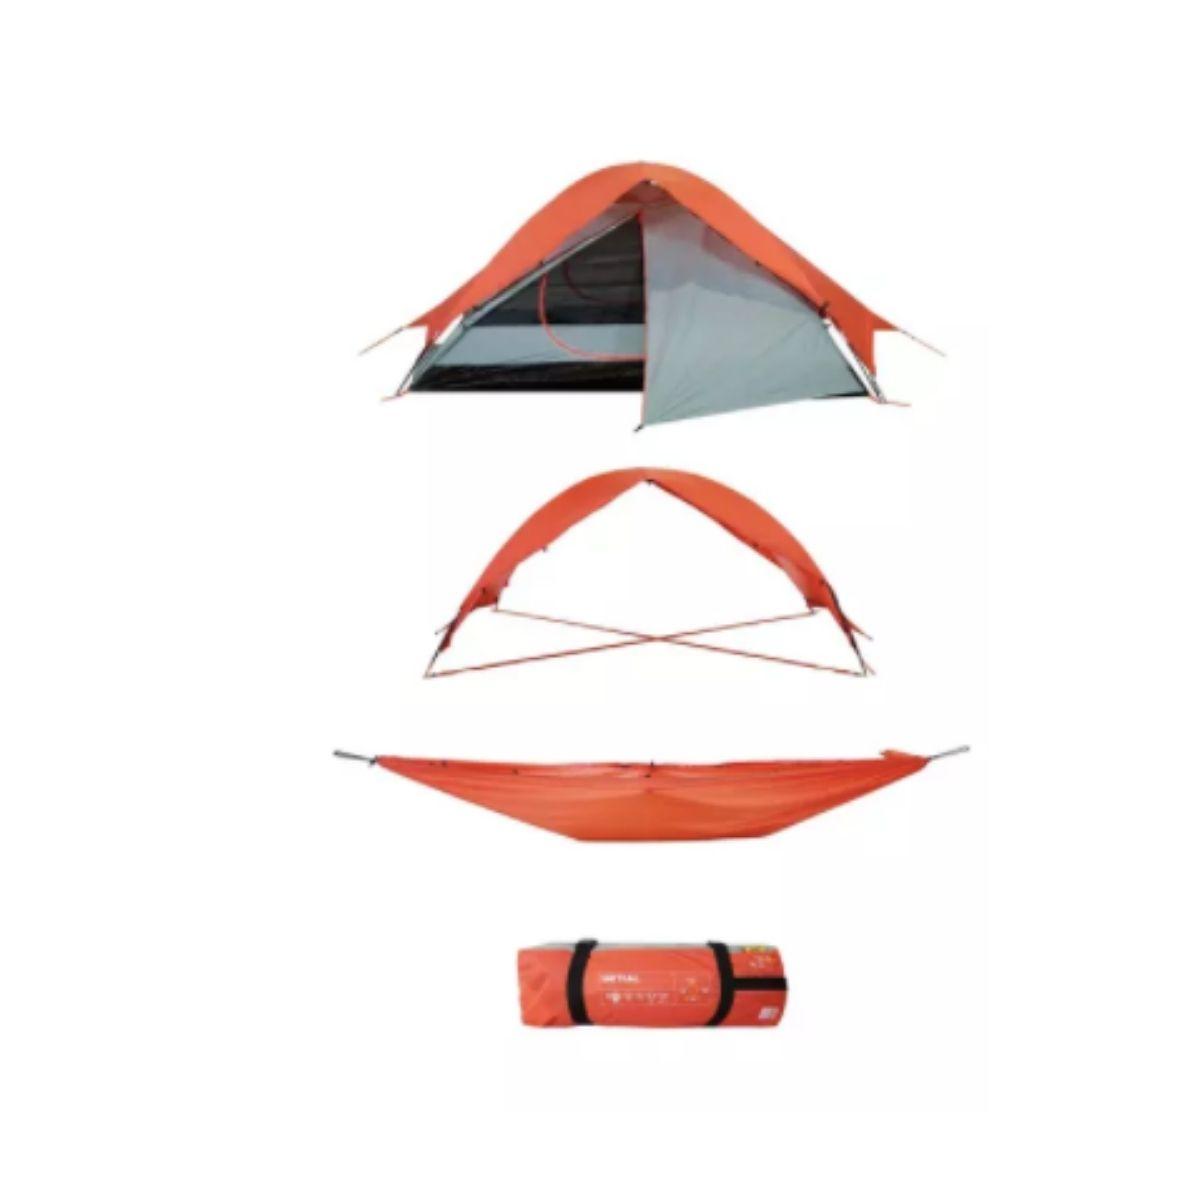 Tente multifonction, 110€